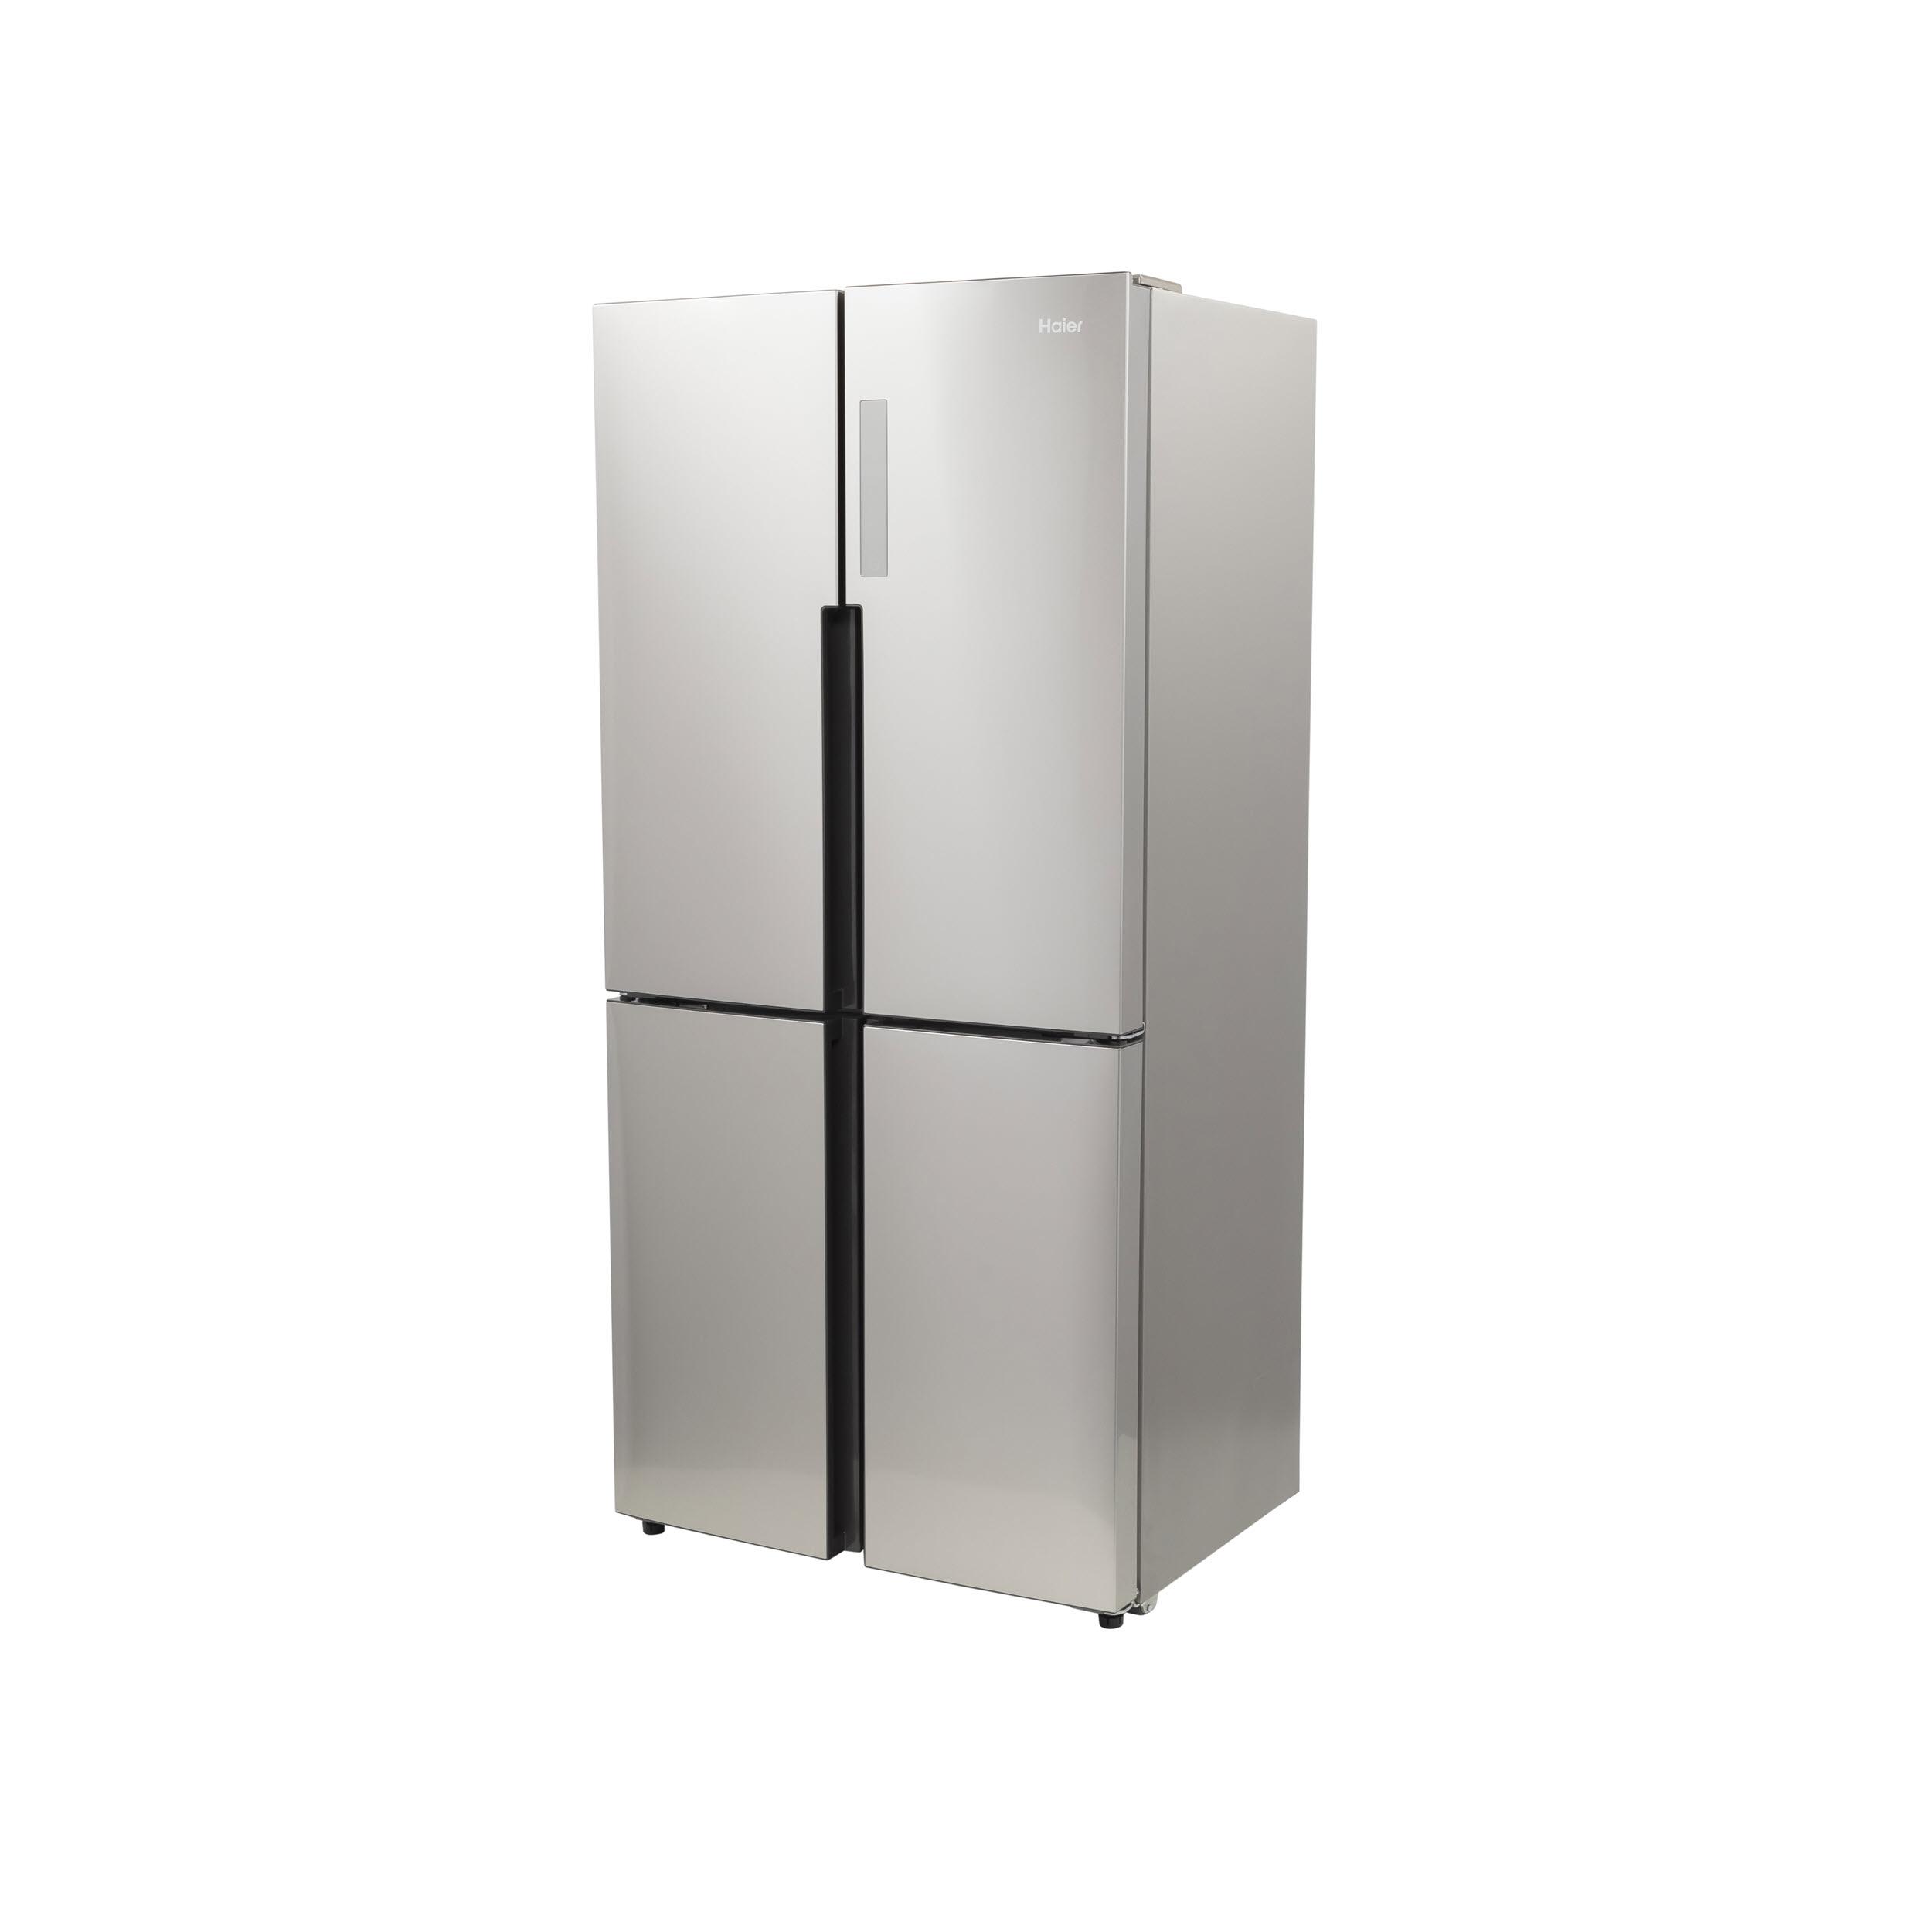 Model: HRQ16N3BGS | Haier 16.4 Cu. Ft. Quad Door Refrigerator